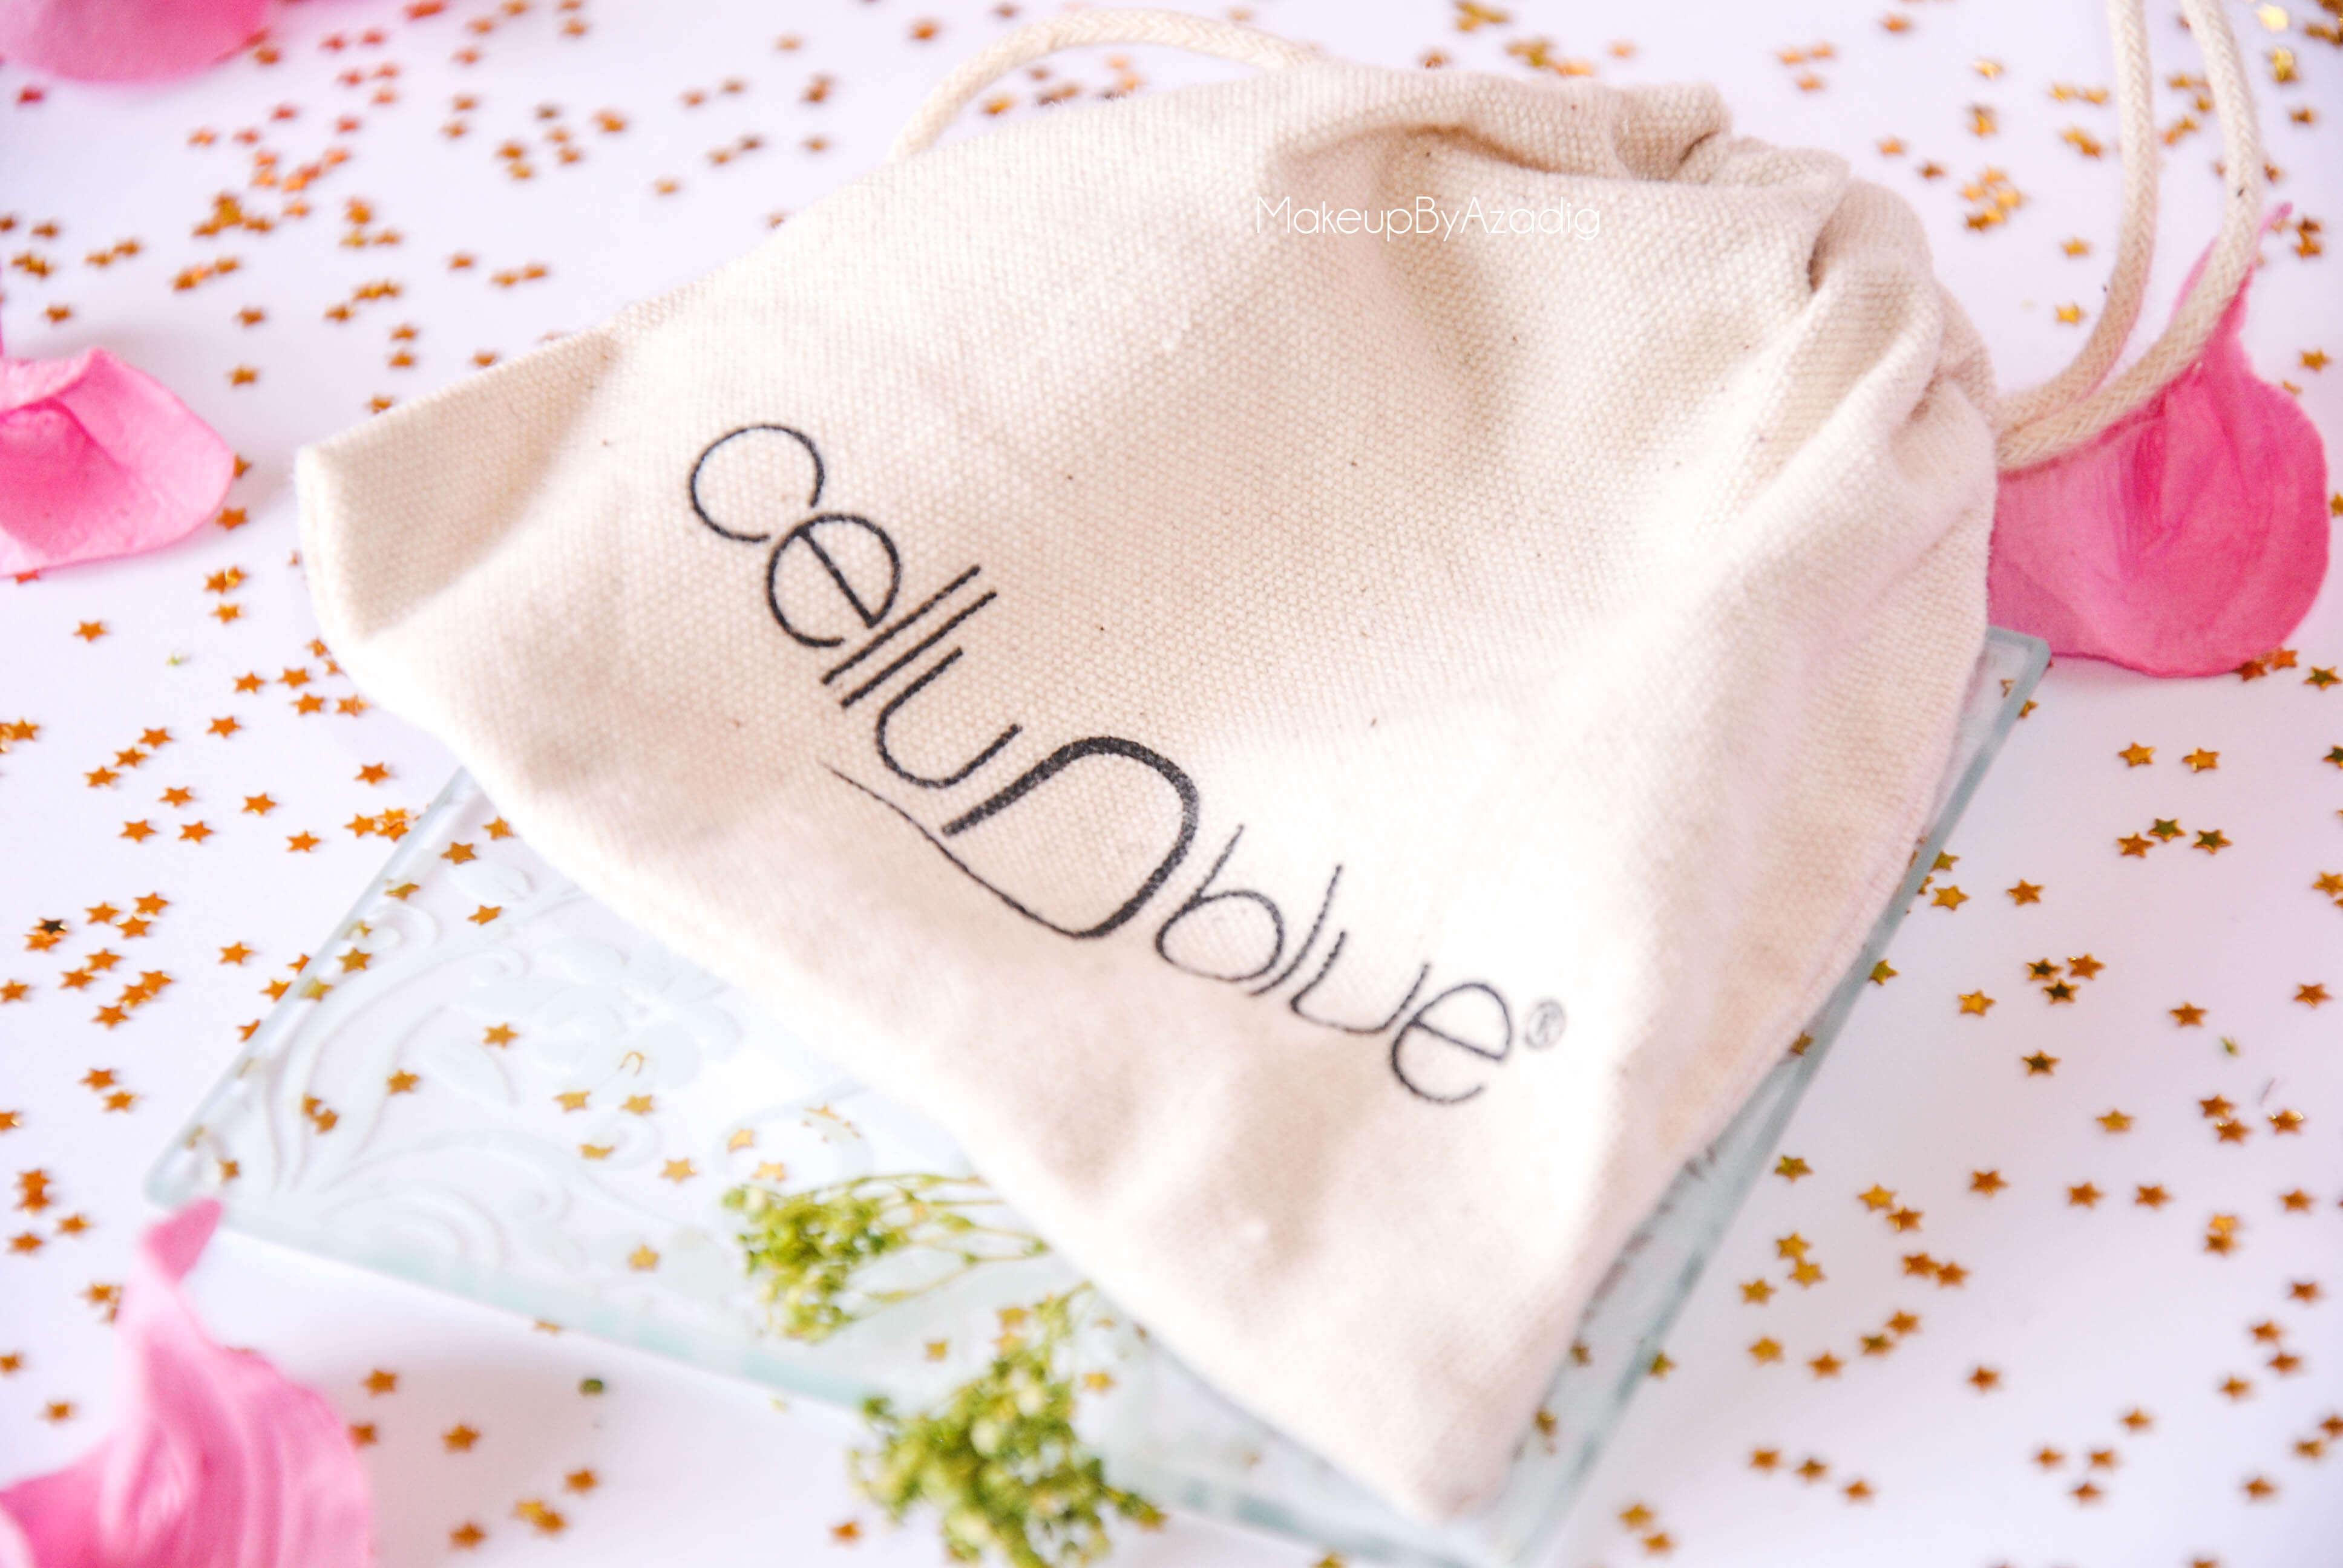 makeupbyazadig-cellublue-ventouse anti cellulite-avis-pochon